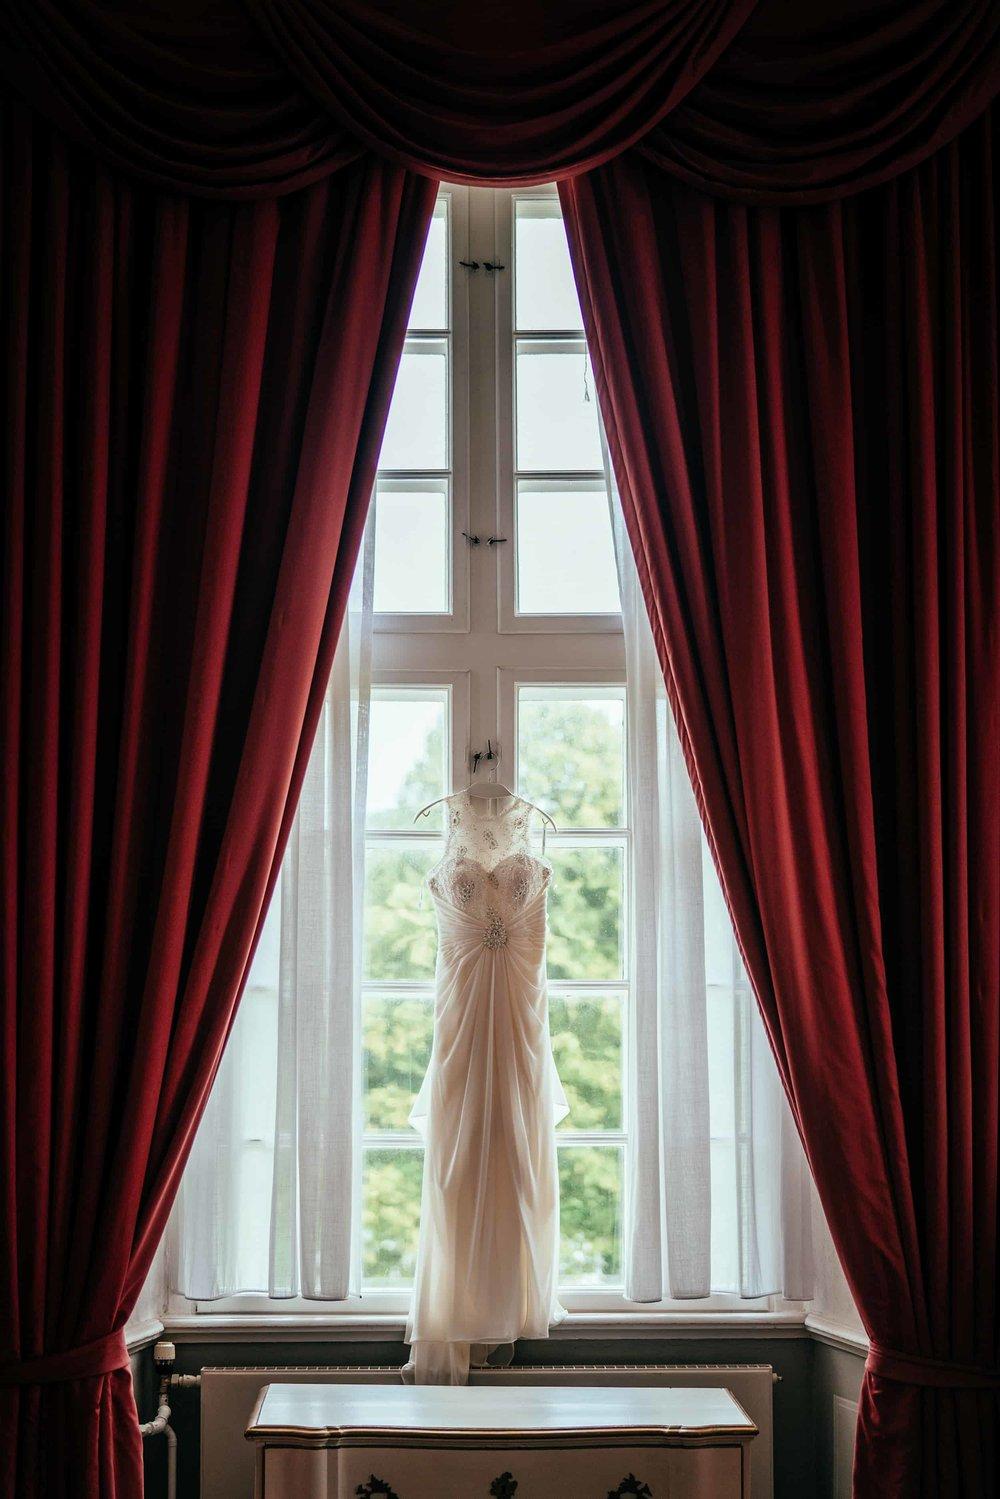 kjole-hænger-i-smukt-vindue.jpg_1.jpg